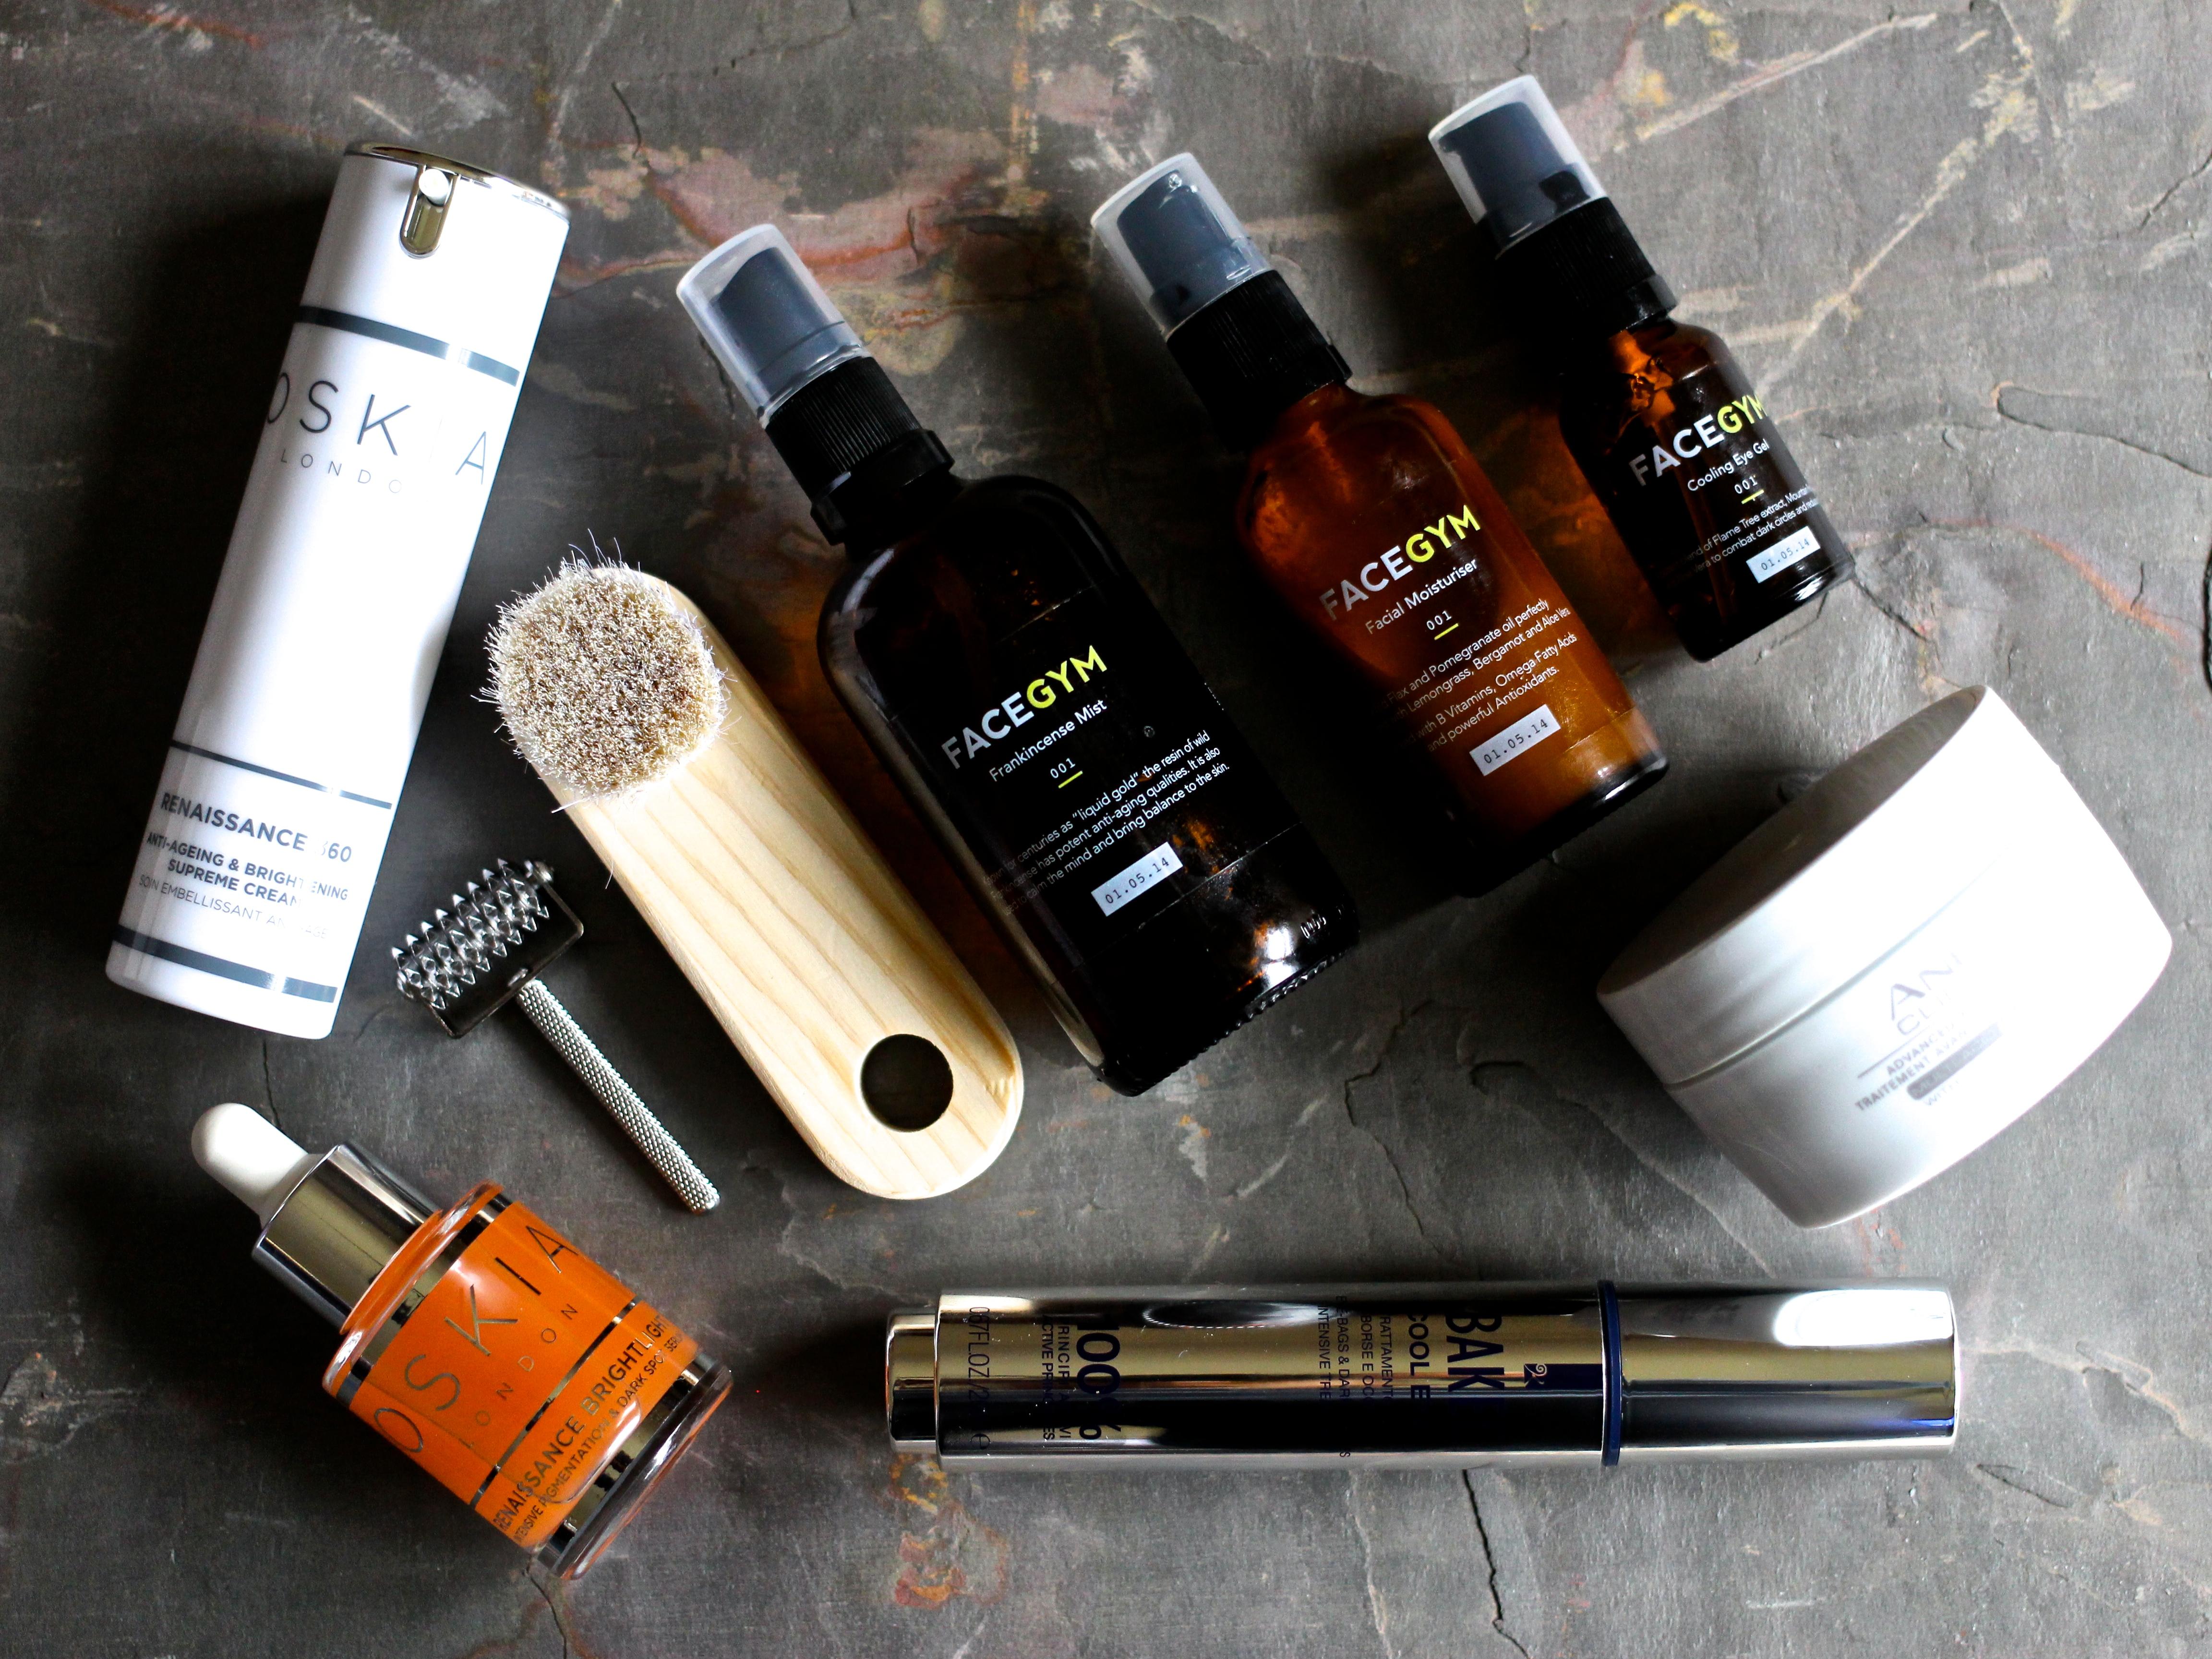 New Skincare